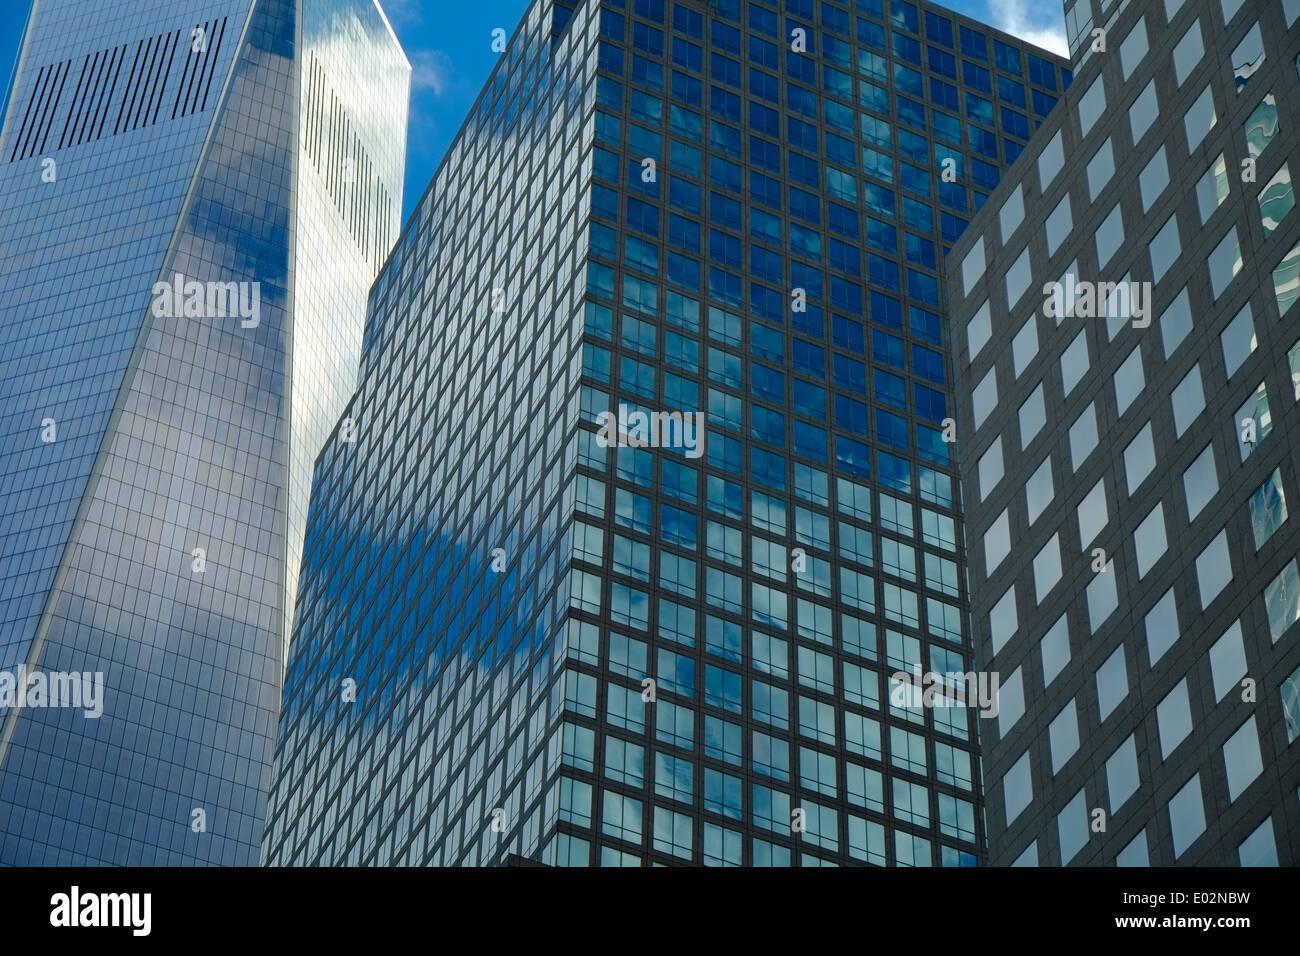 Modern office buildings, Financial district, Manhattan, New York - Stock Image